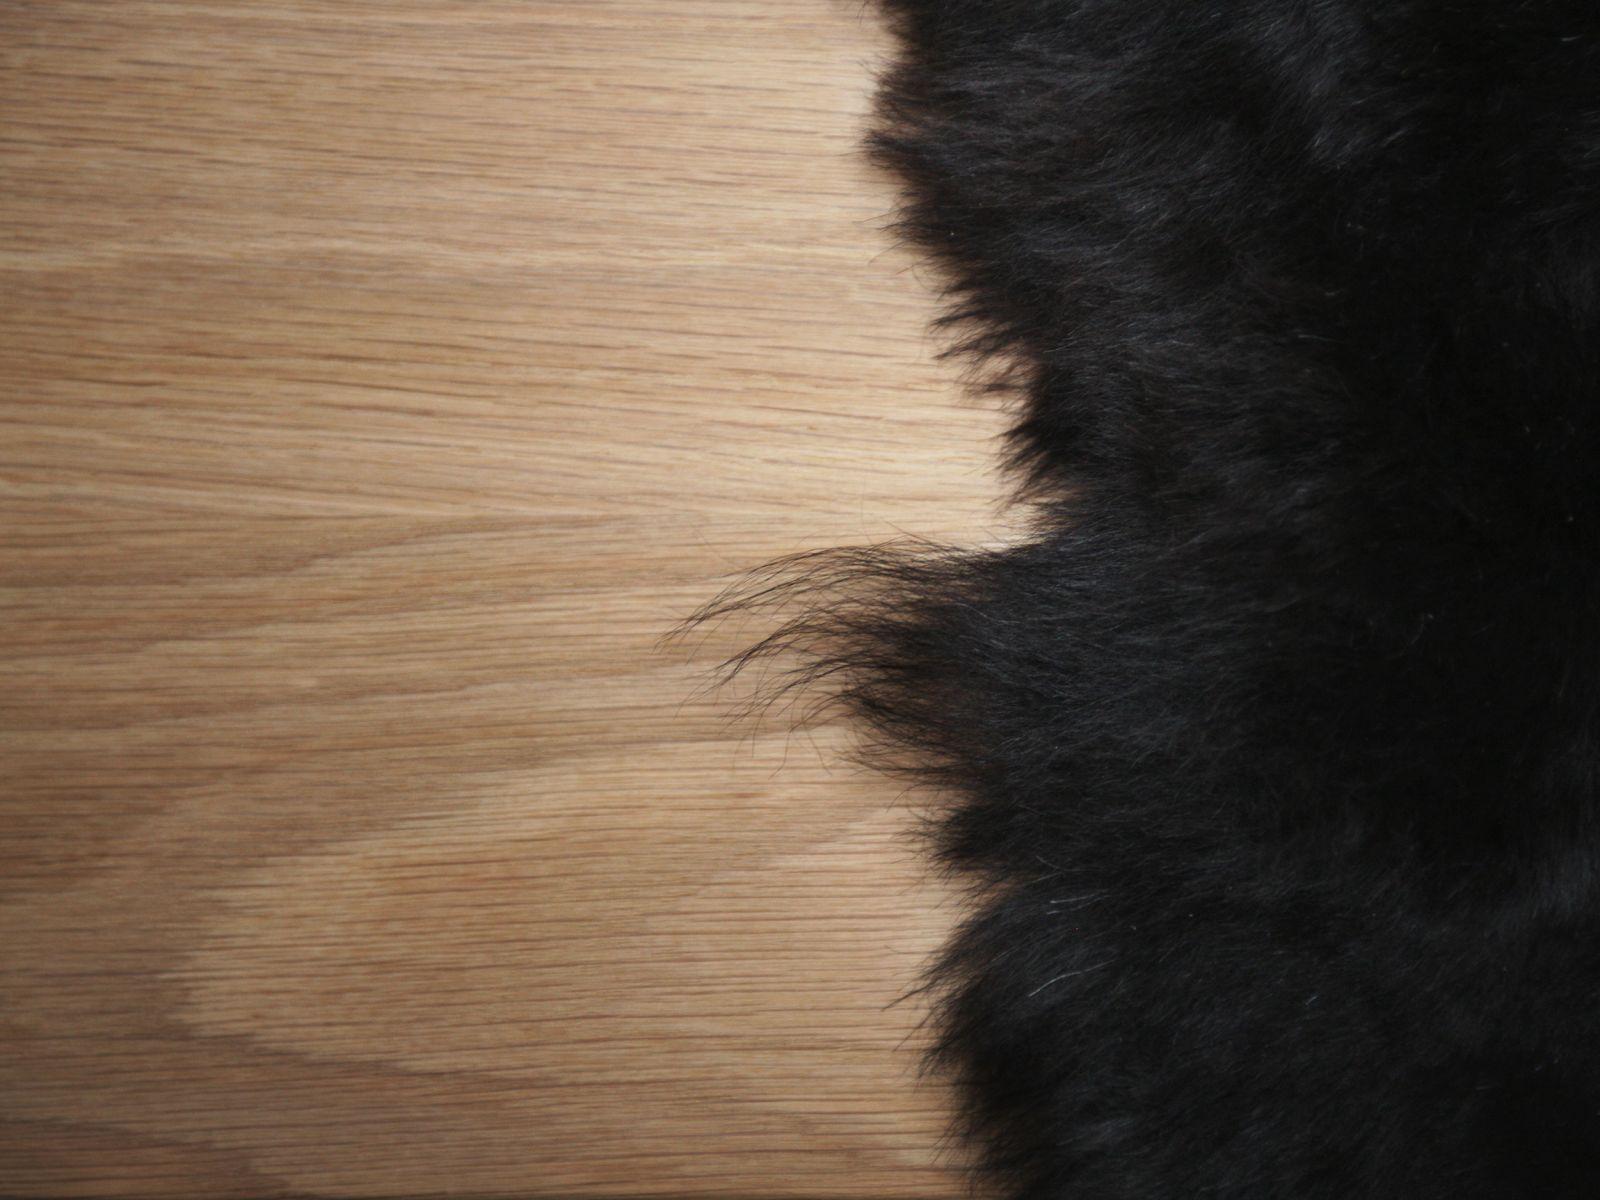 Groovy Black Sheep Bench Furniture For Mmood Loudordesign Inzonedesignstudio Interior Chair Design Inzonedesignstudiocom